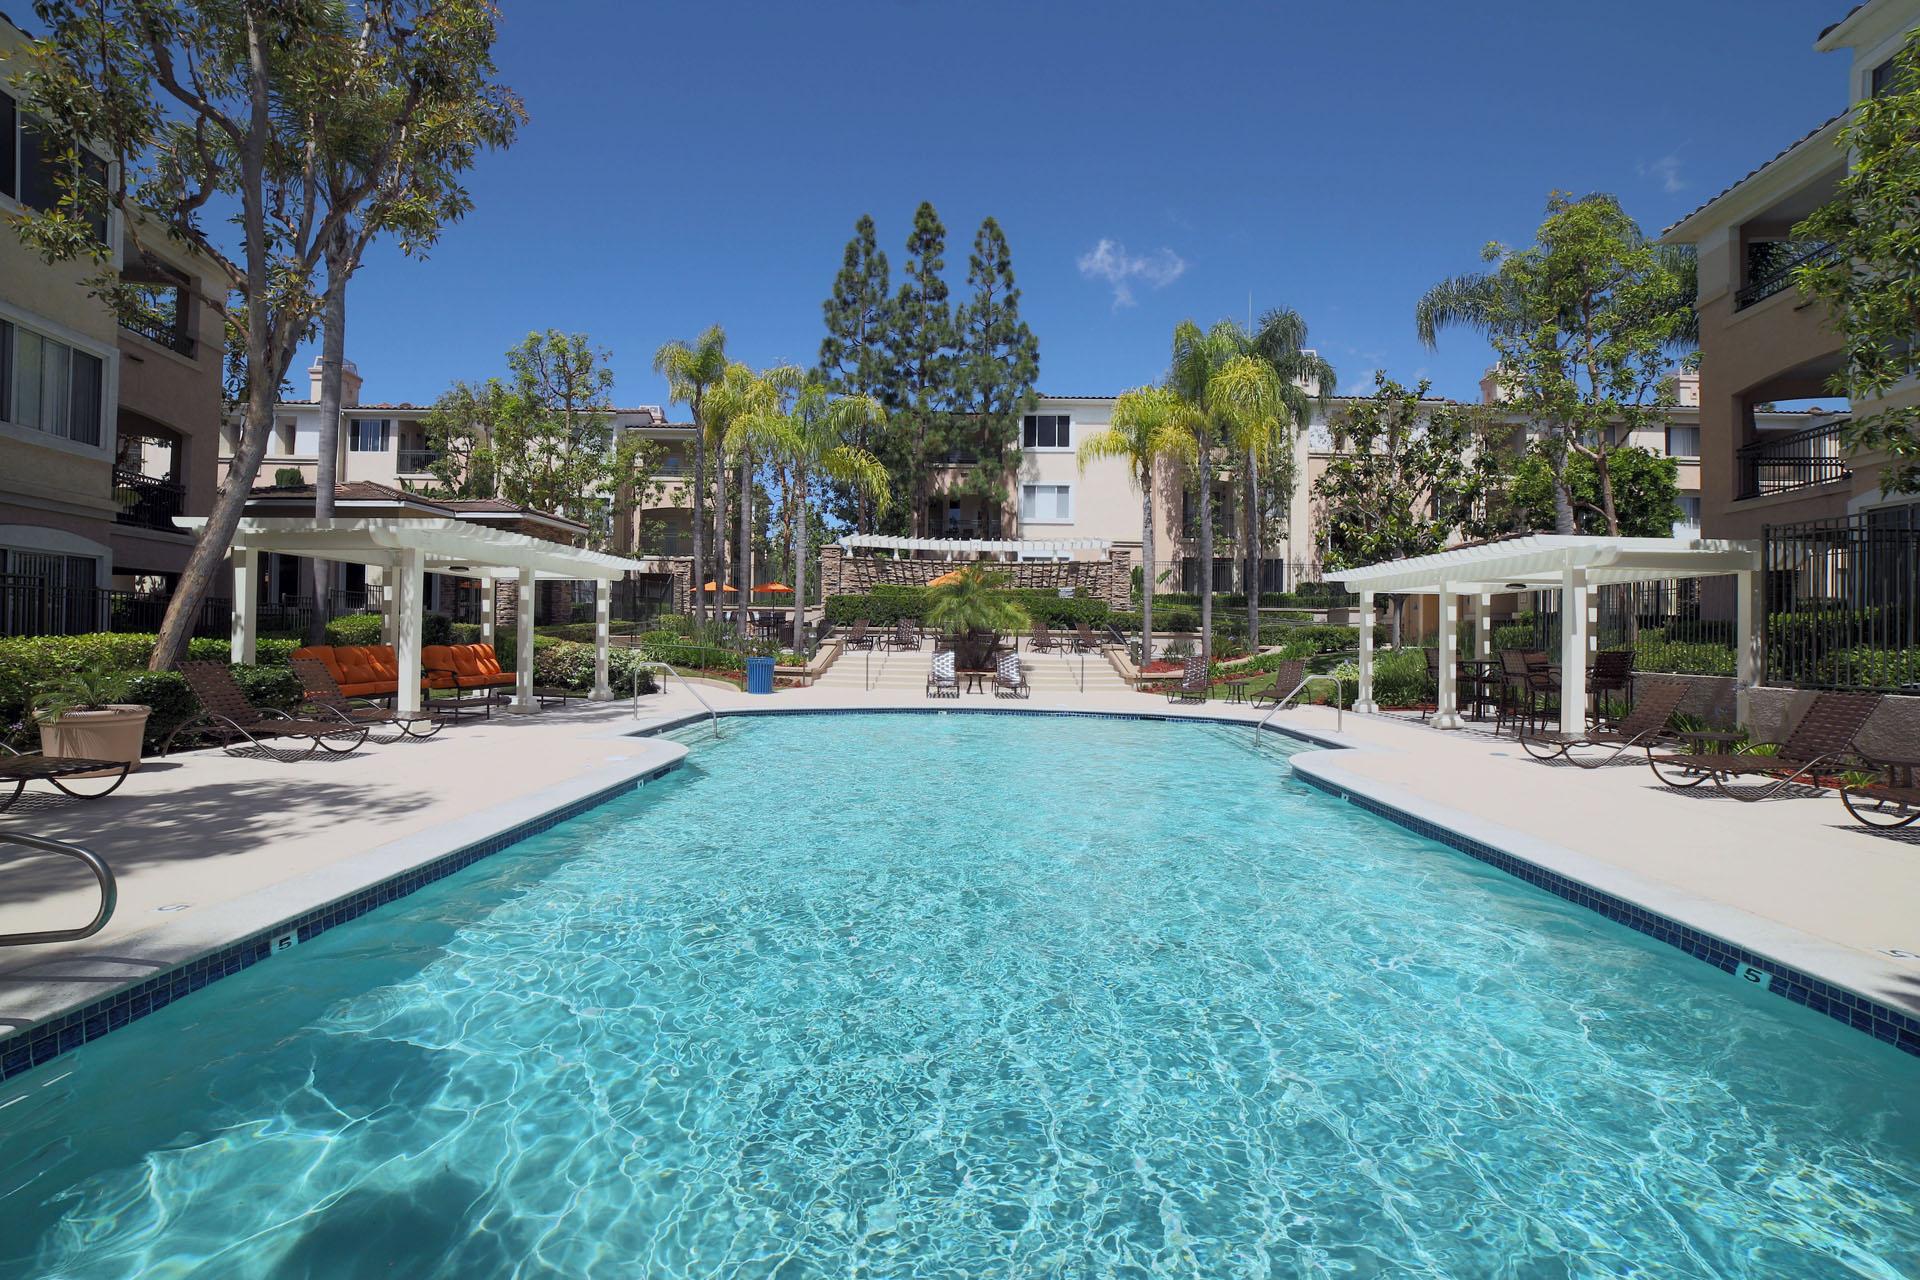 The Aventine pool